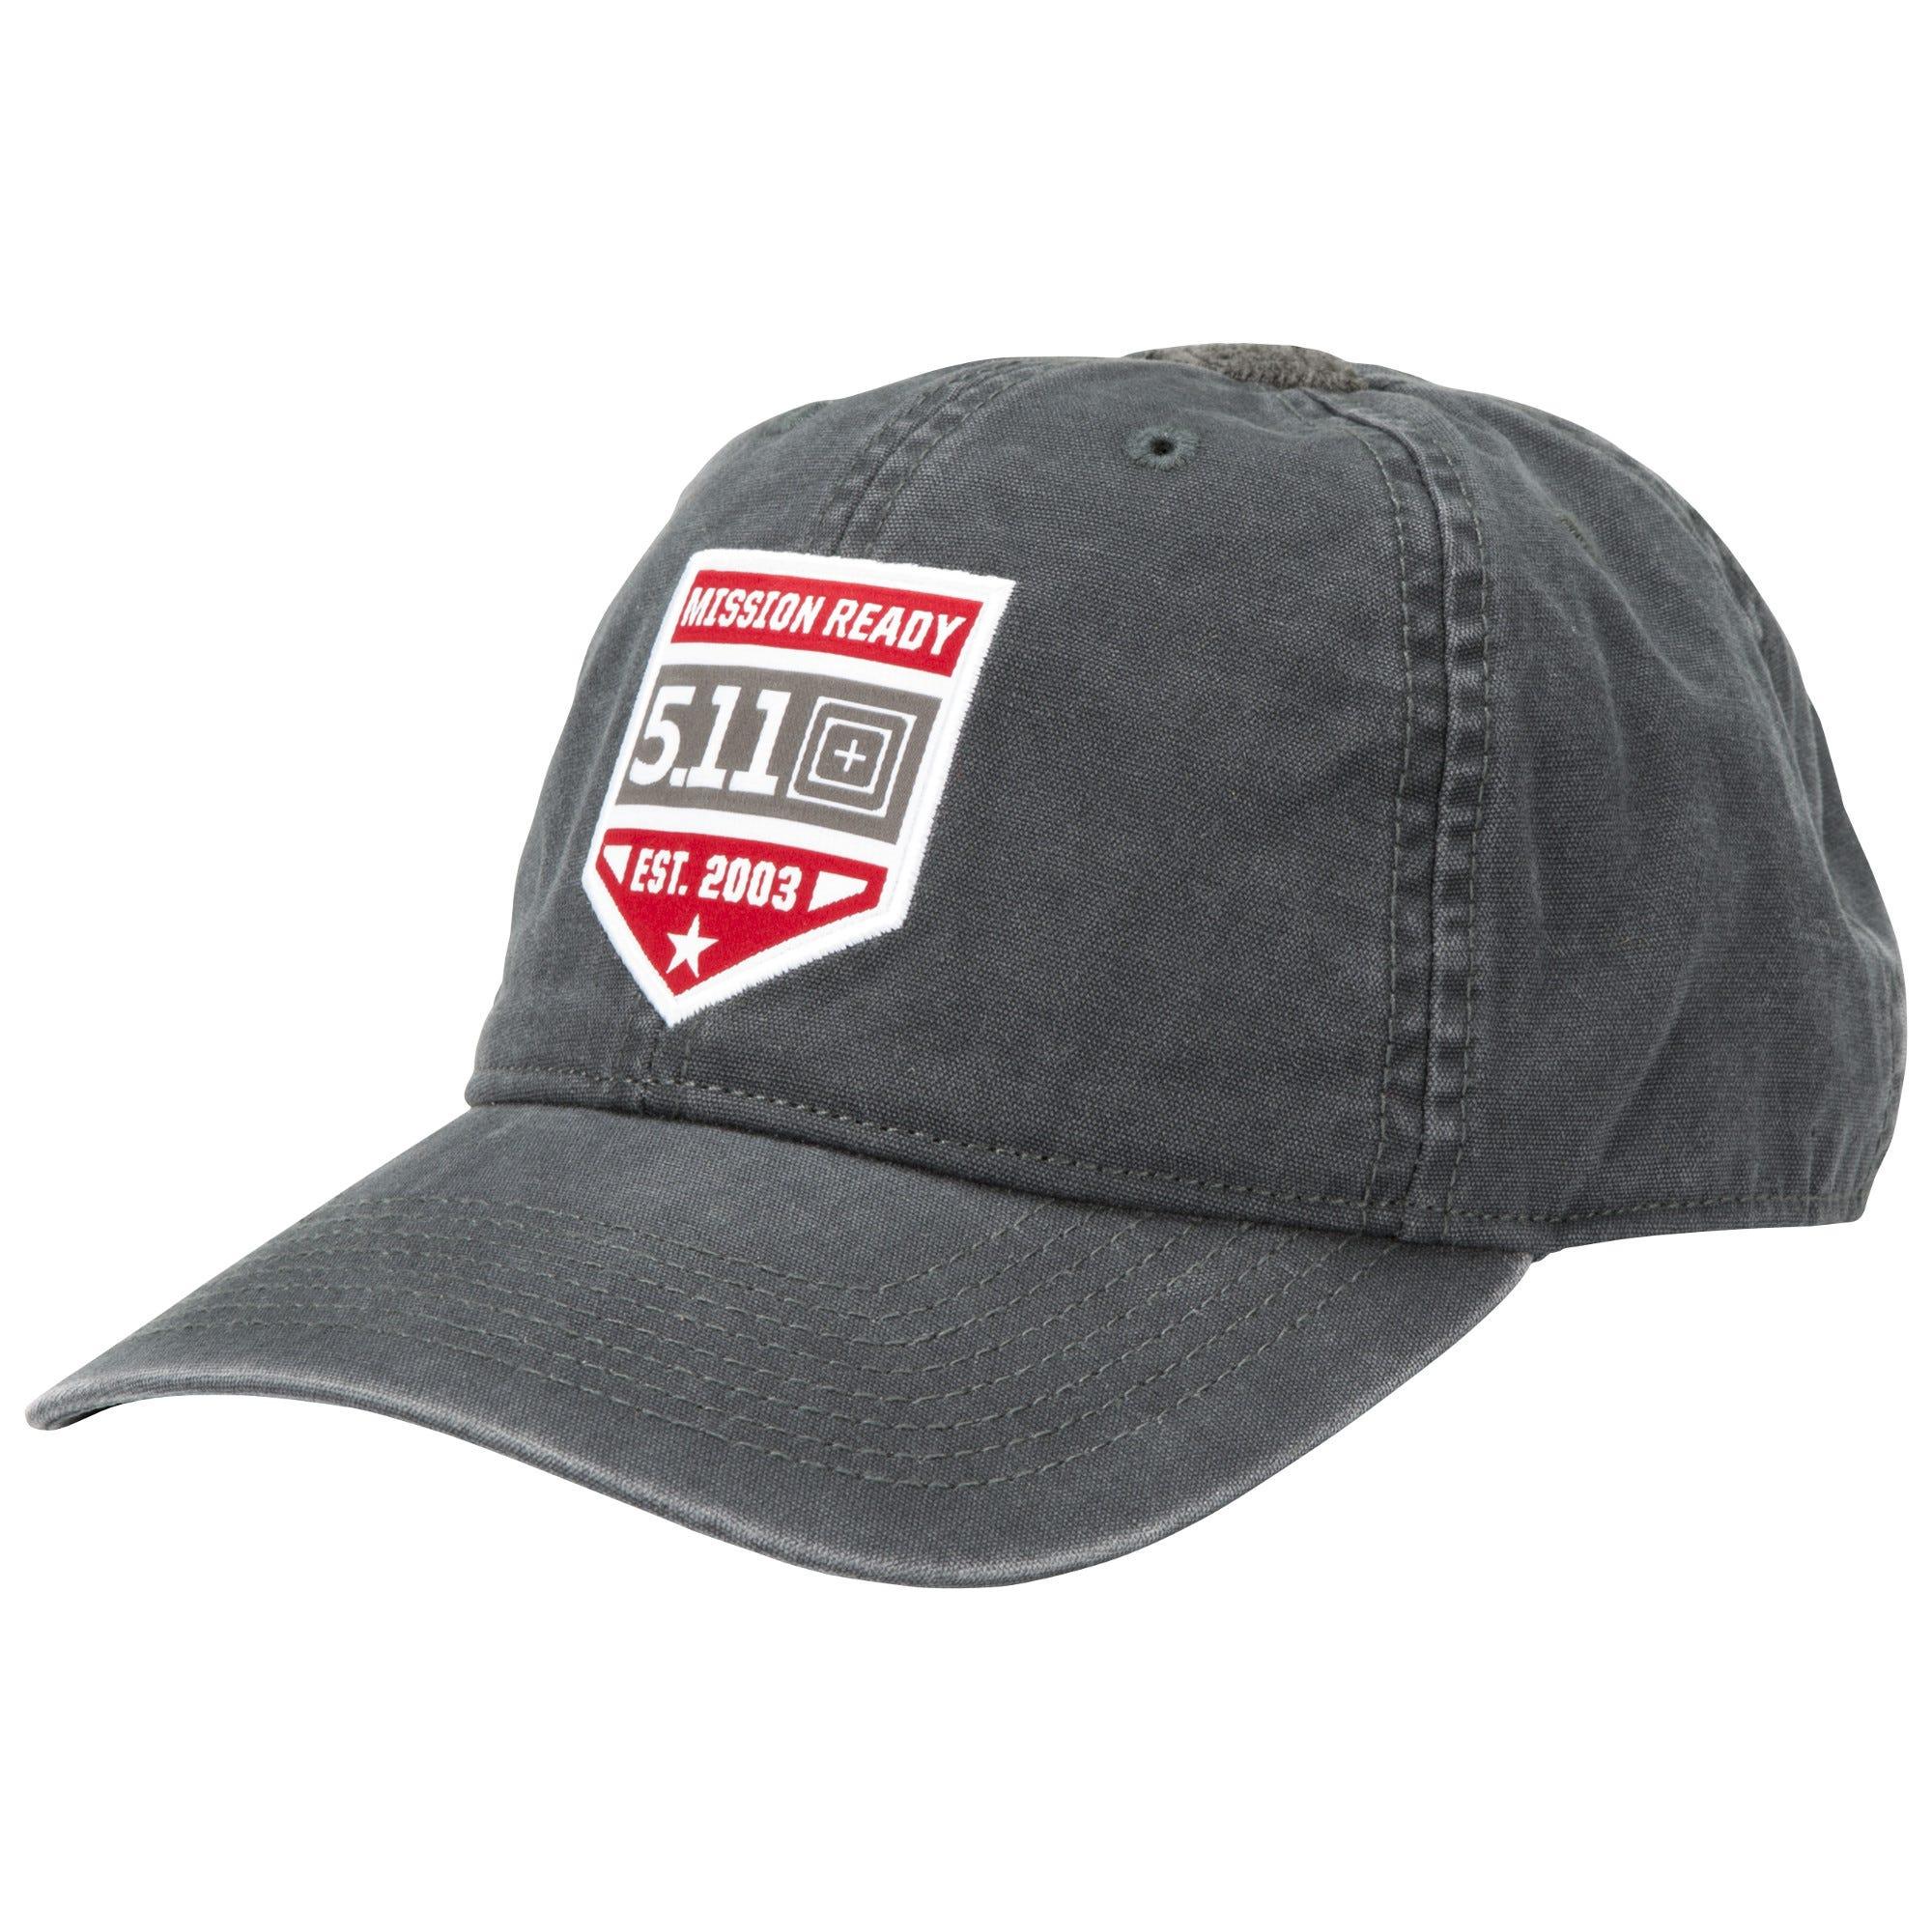 5.11 Tactical Men's Mission Ready™ Cap